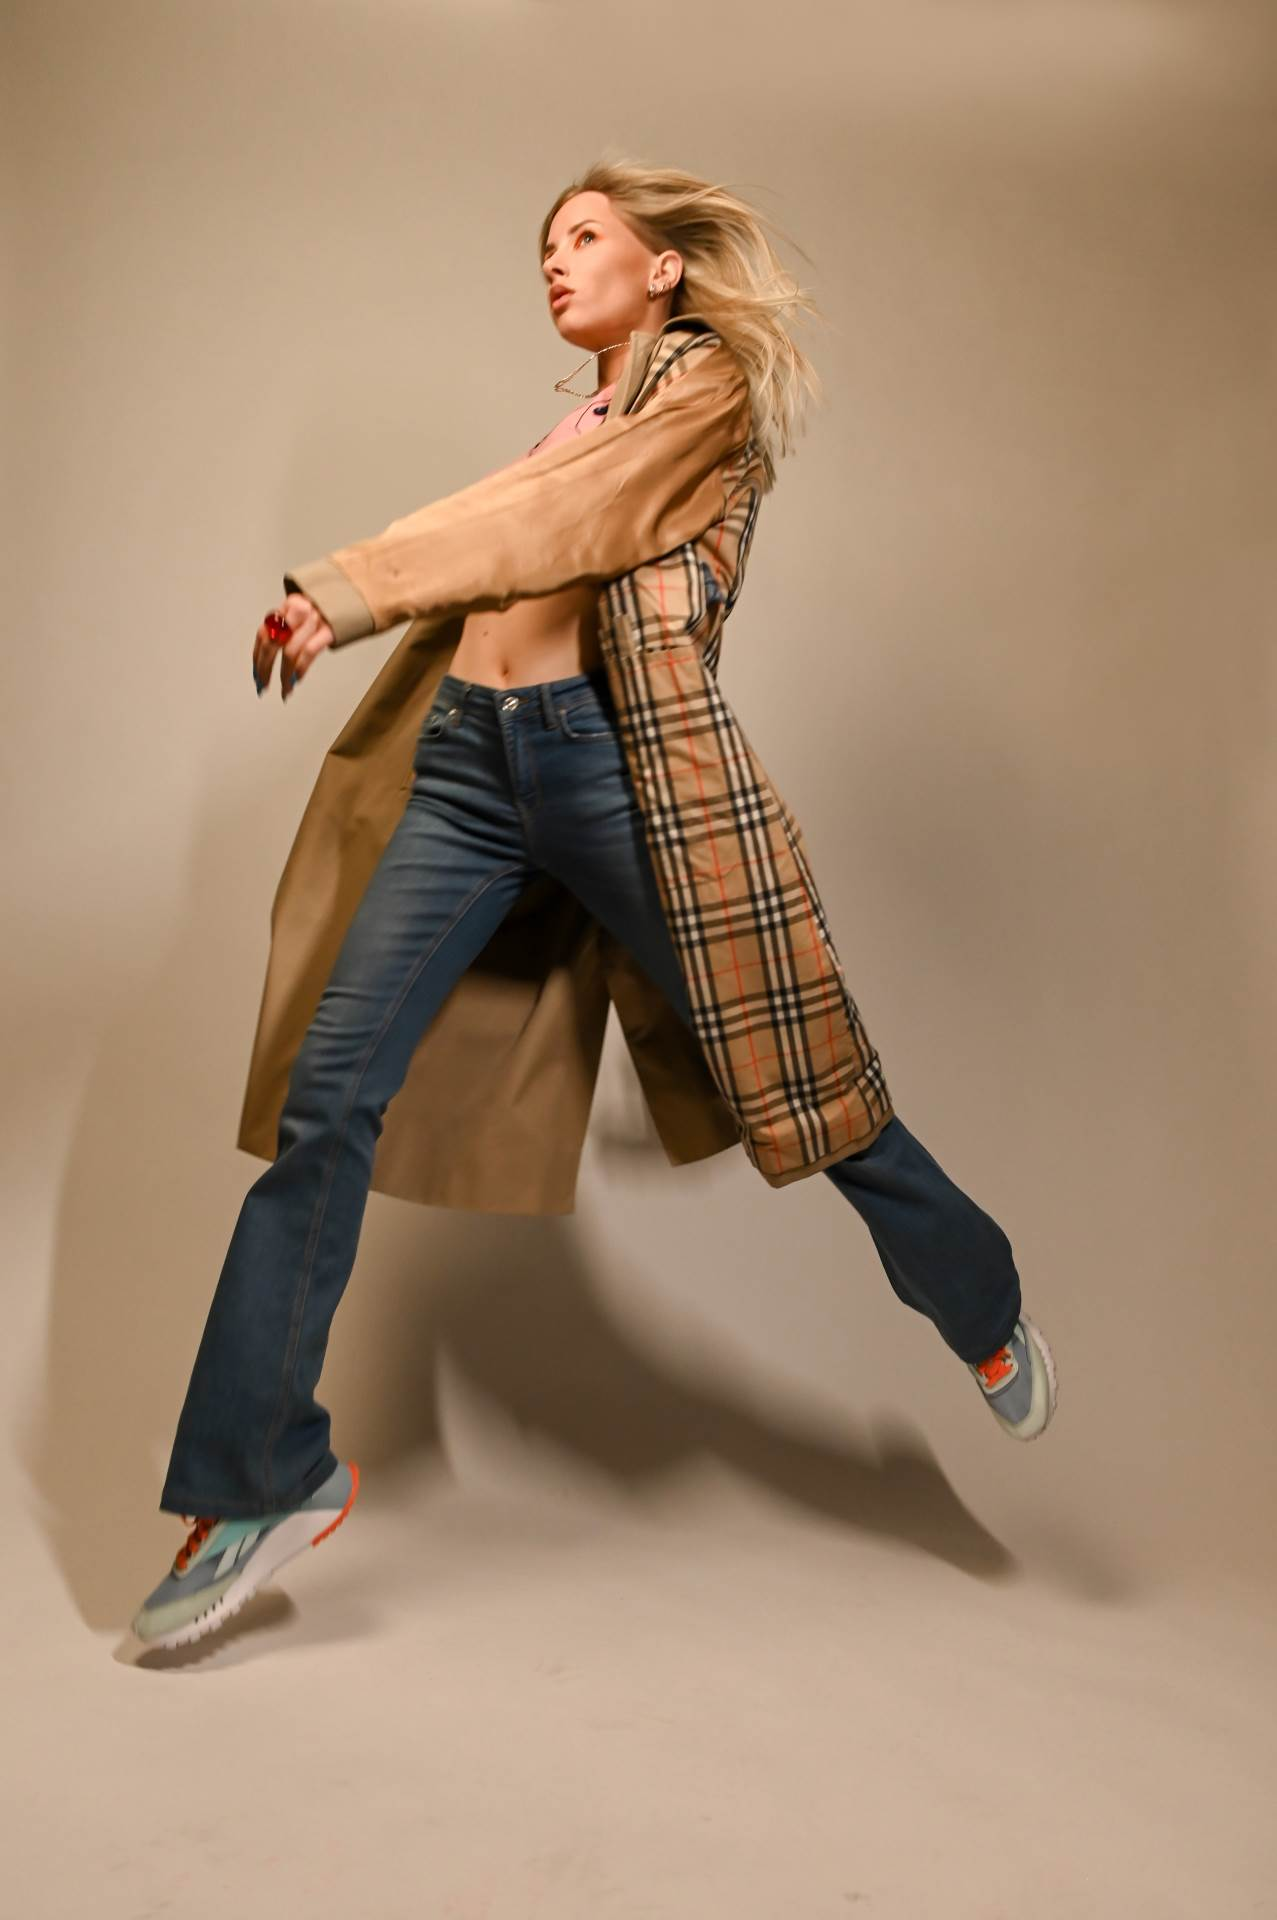 Reebok tenisice Classic Leather Legacy Marcela nosi uz Vintage Baby Phat mini pulover, Lowcost Luxe Vintage Burberry baloner, Dee vintage stare hlače iz Zare i prsten Reto centar